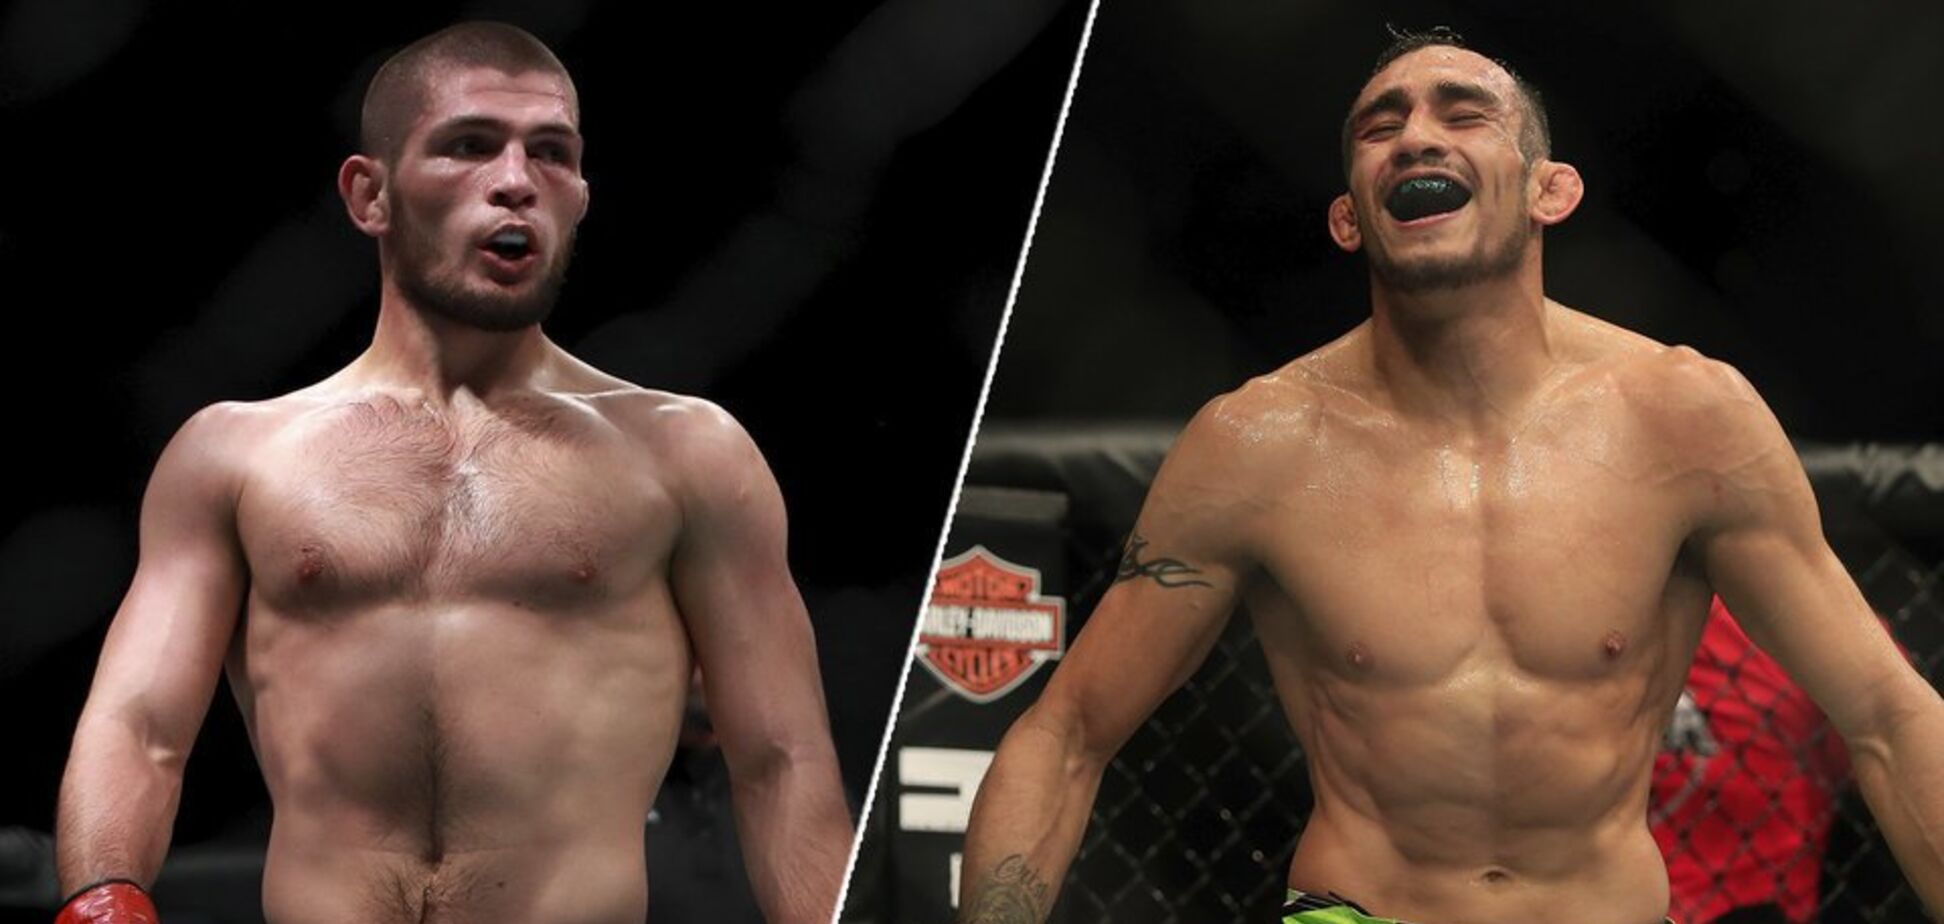 ''Ти дурень!'' Знаменитий боєць UFC принизив ''c*чку Хабіба ''